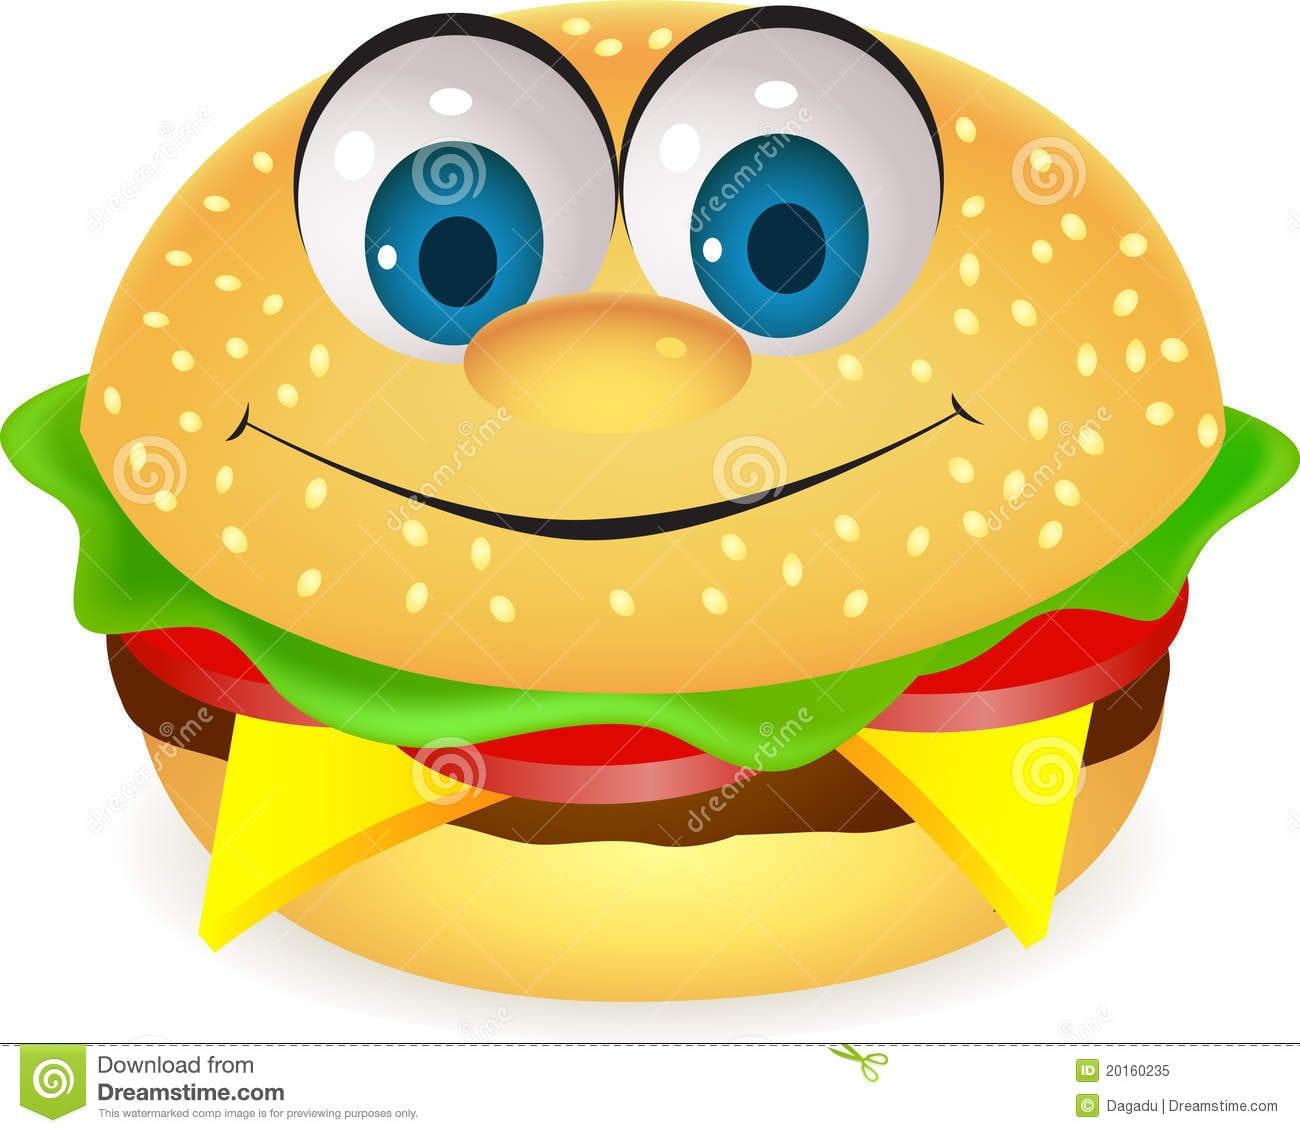 Foto De Stock  Funny Burger Cartoon  Imagem